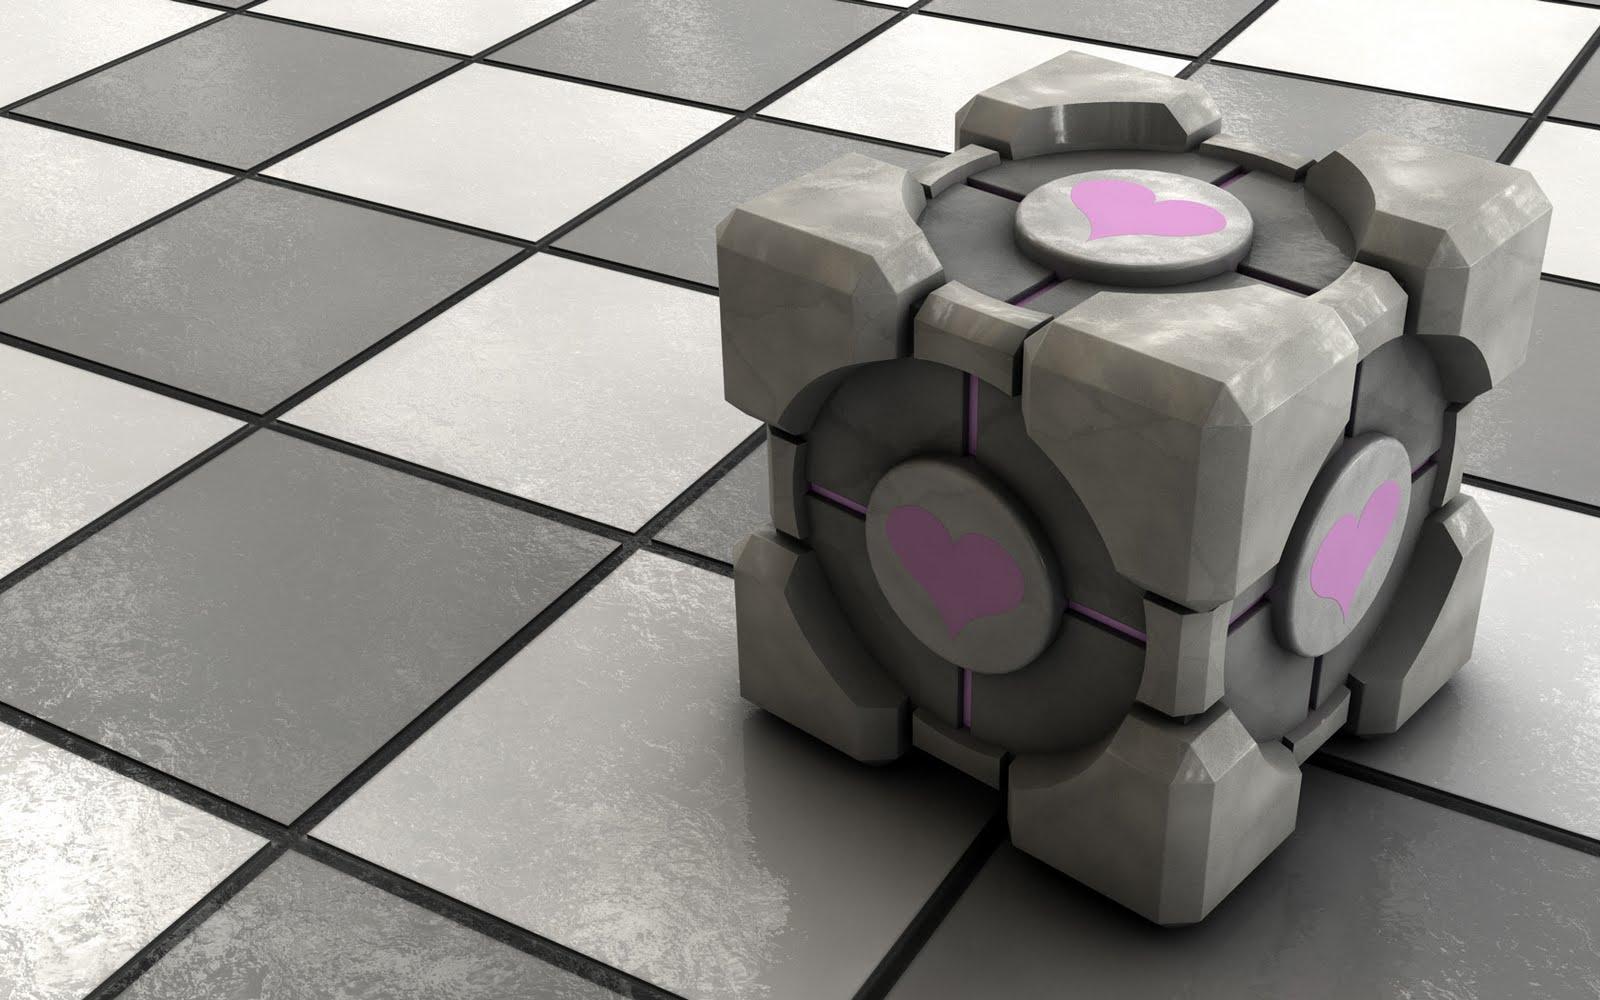 http://2.bp.blogspot.com/_HzAThb2RgMc/TLxiDw2g_dI/AAAAAAAABoc/gL3CNIteYW0/s1600/Weighted_Companion_Cube_by_Matarsak.jpg